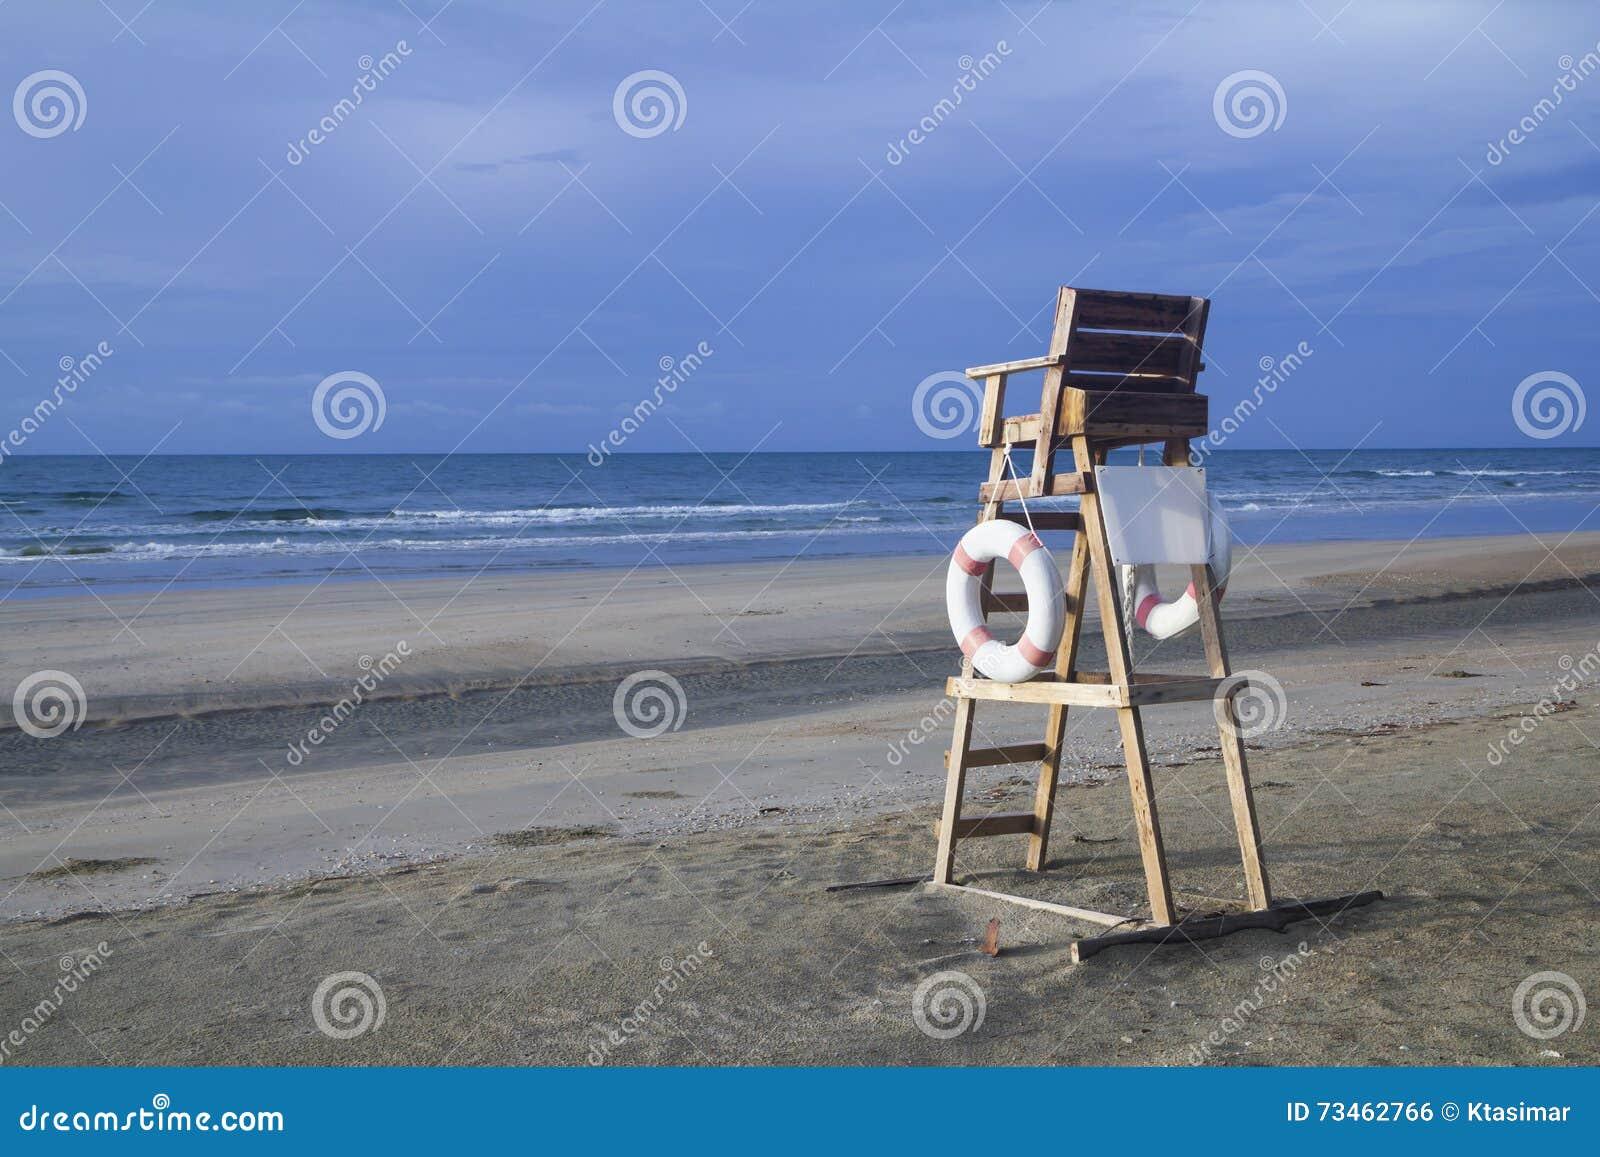 Lifeguard chair on stormy beach